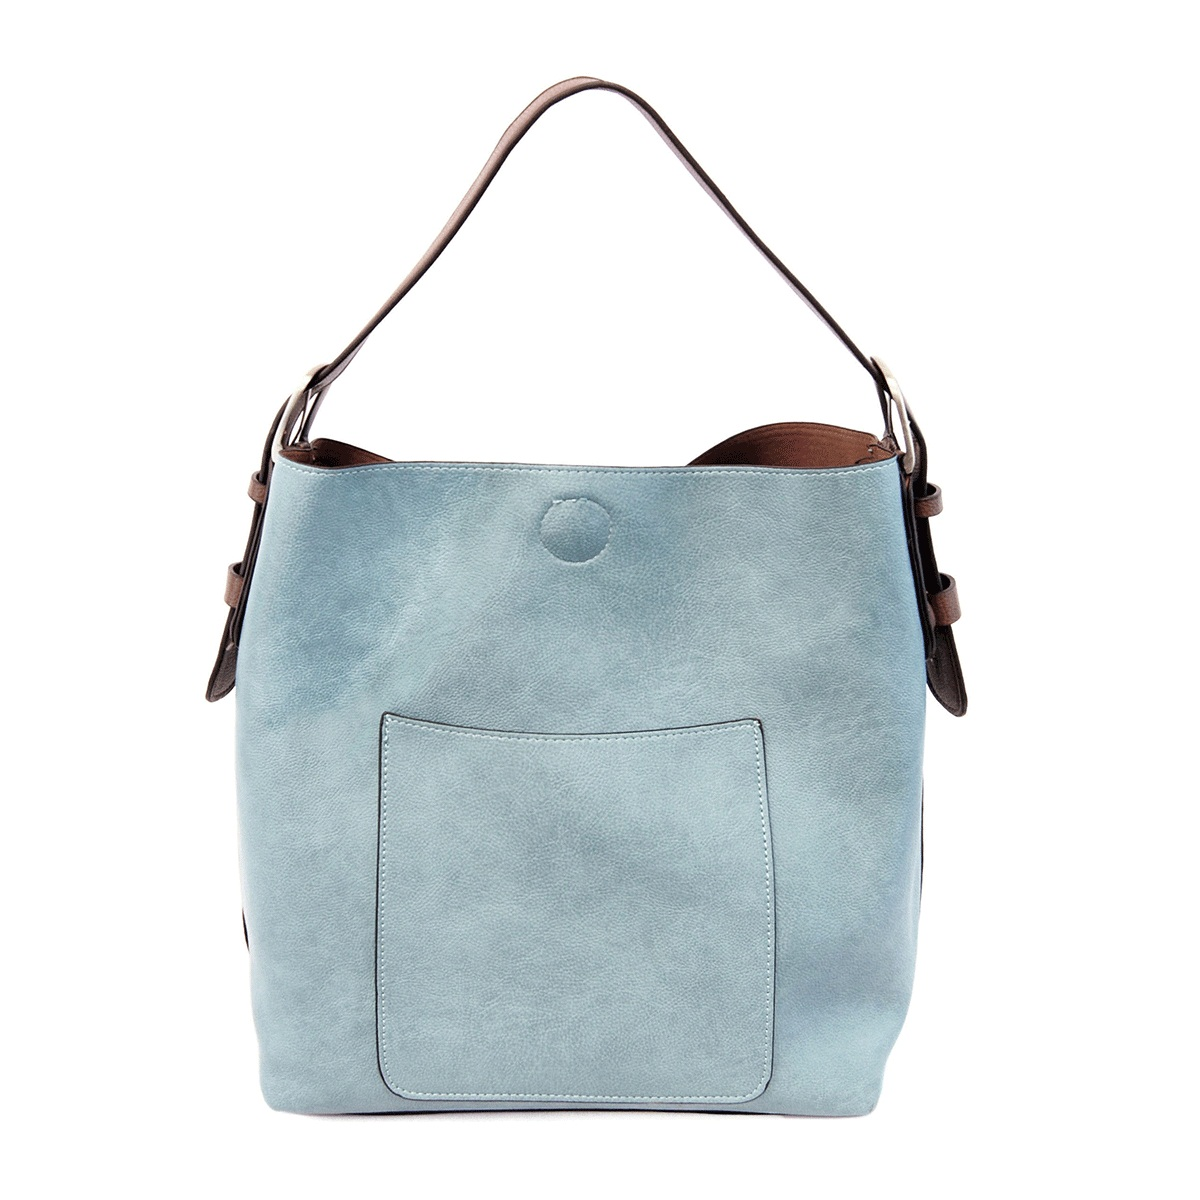 Hobo Handbag-$68.00